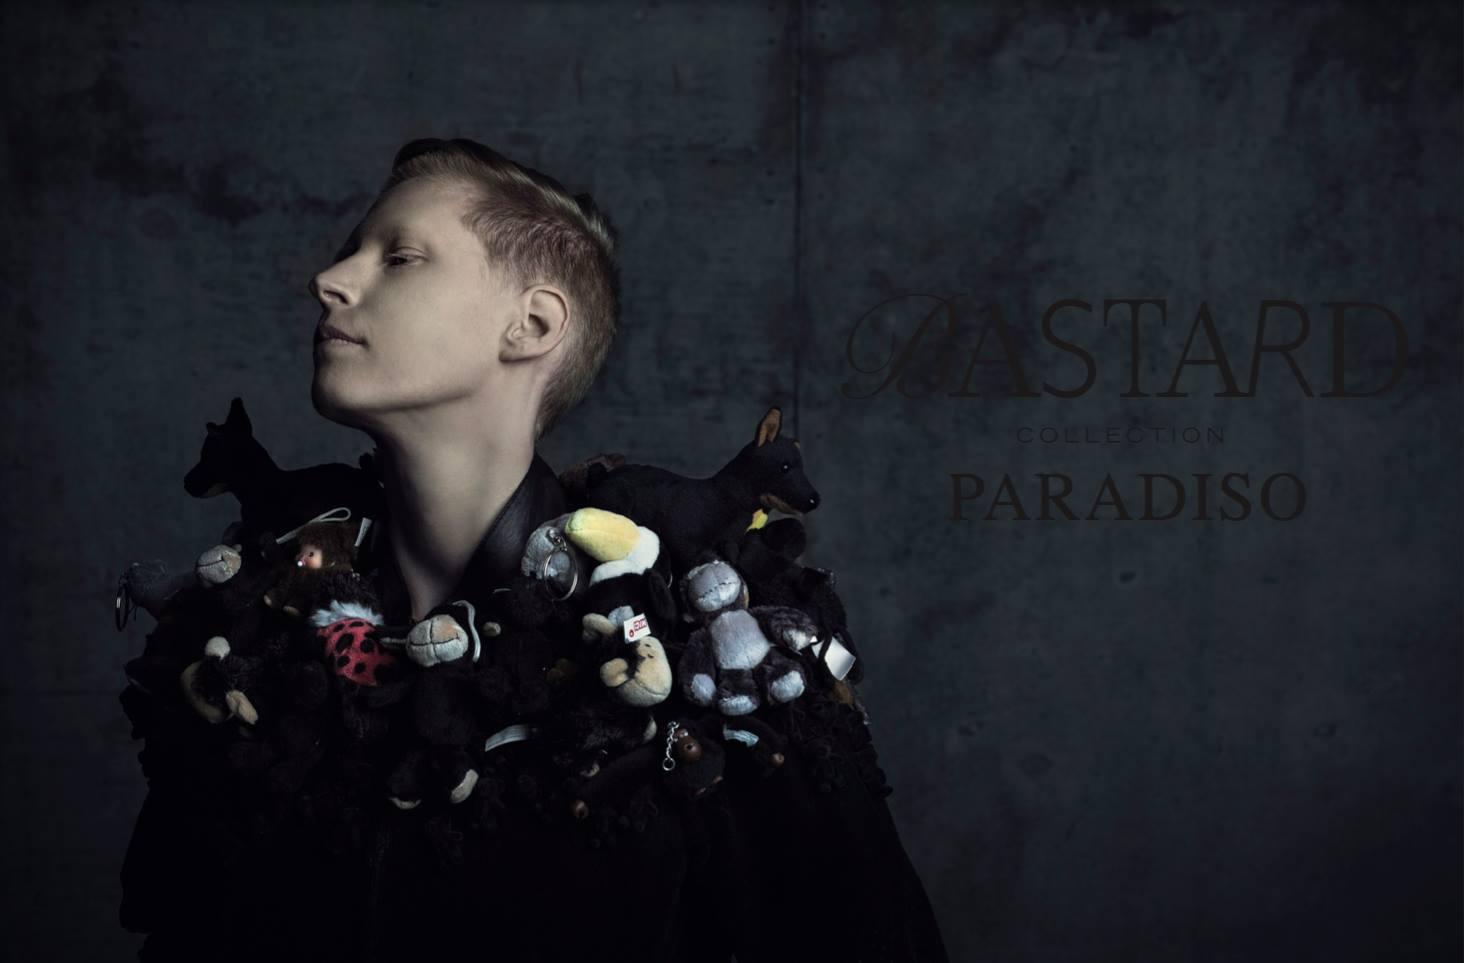 BASTARD Paradiso: 12.November 2016 um 19 Uhr Opening/Vernissage!